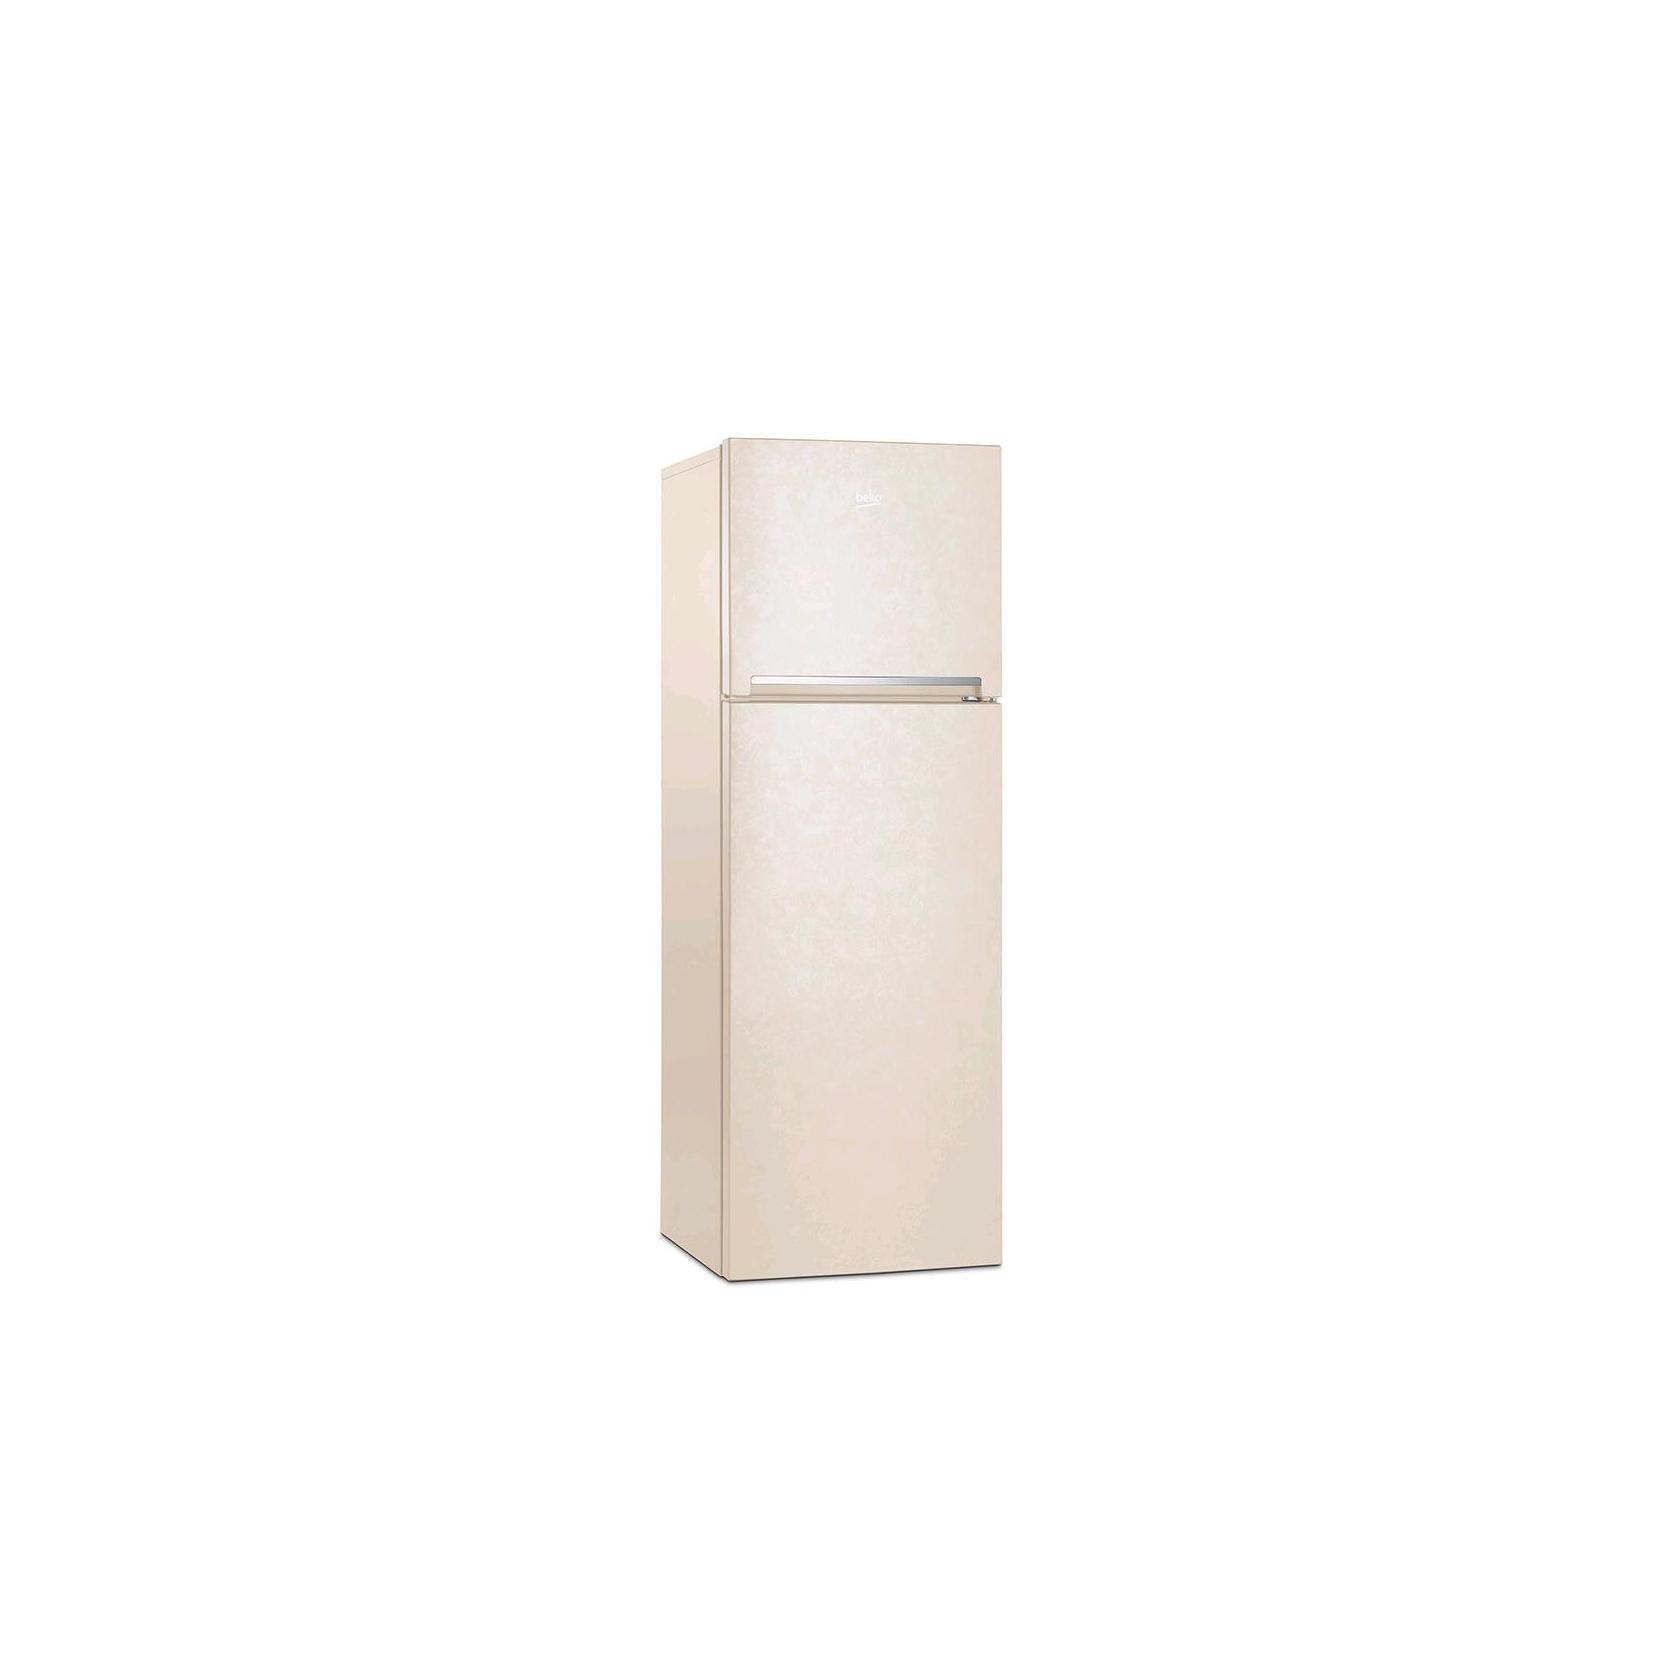 Beko rdsa310m20b frigorifero doppia porta ventilato classe - Frigoriferi doppia porta classe a ...